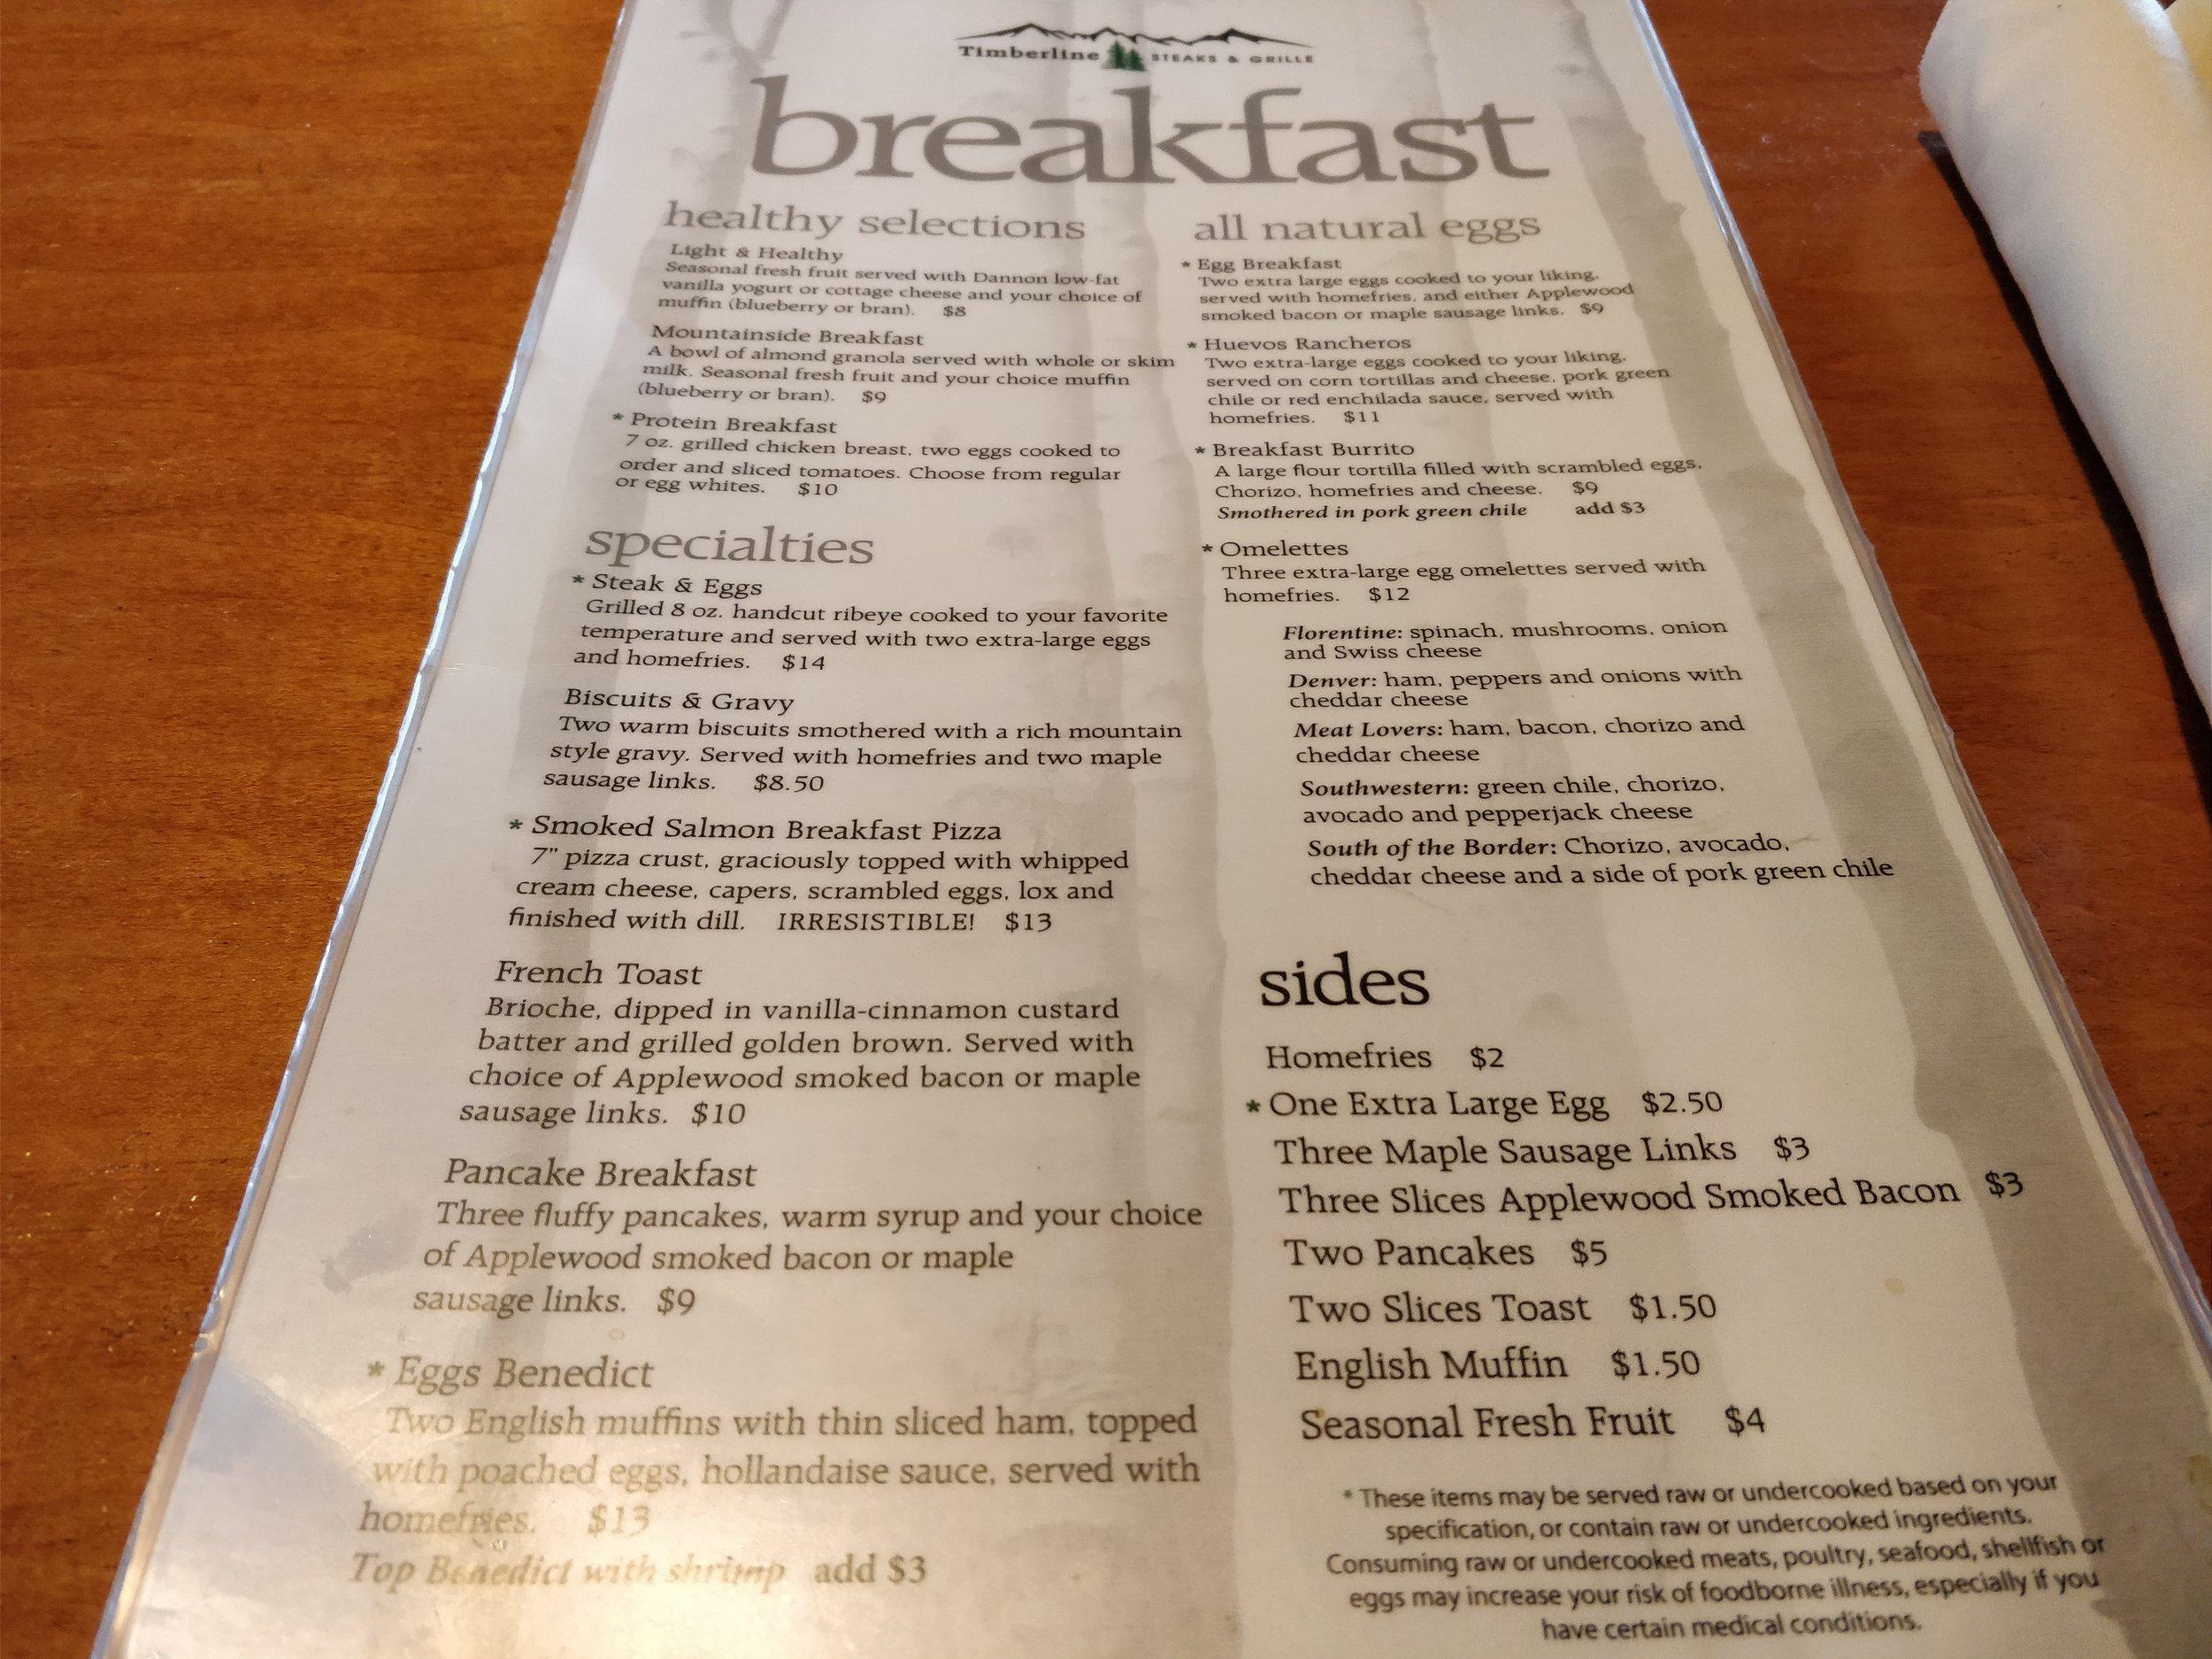 timberline steaks & grille breakfast menu